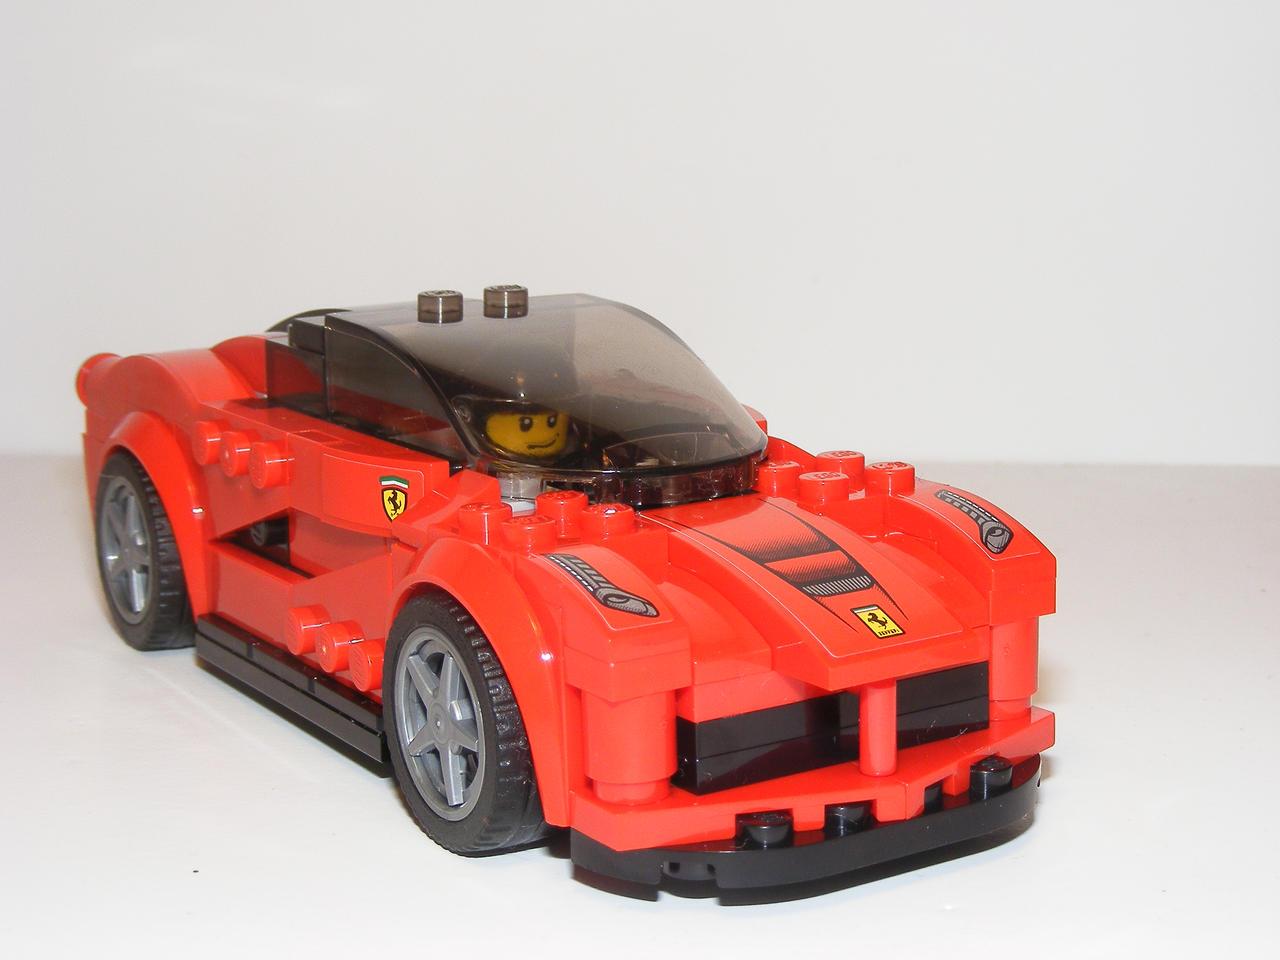 Ferrari Laferrari Lego By Toniosteiner On Deviantart